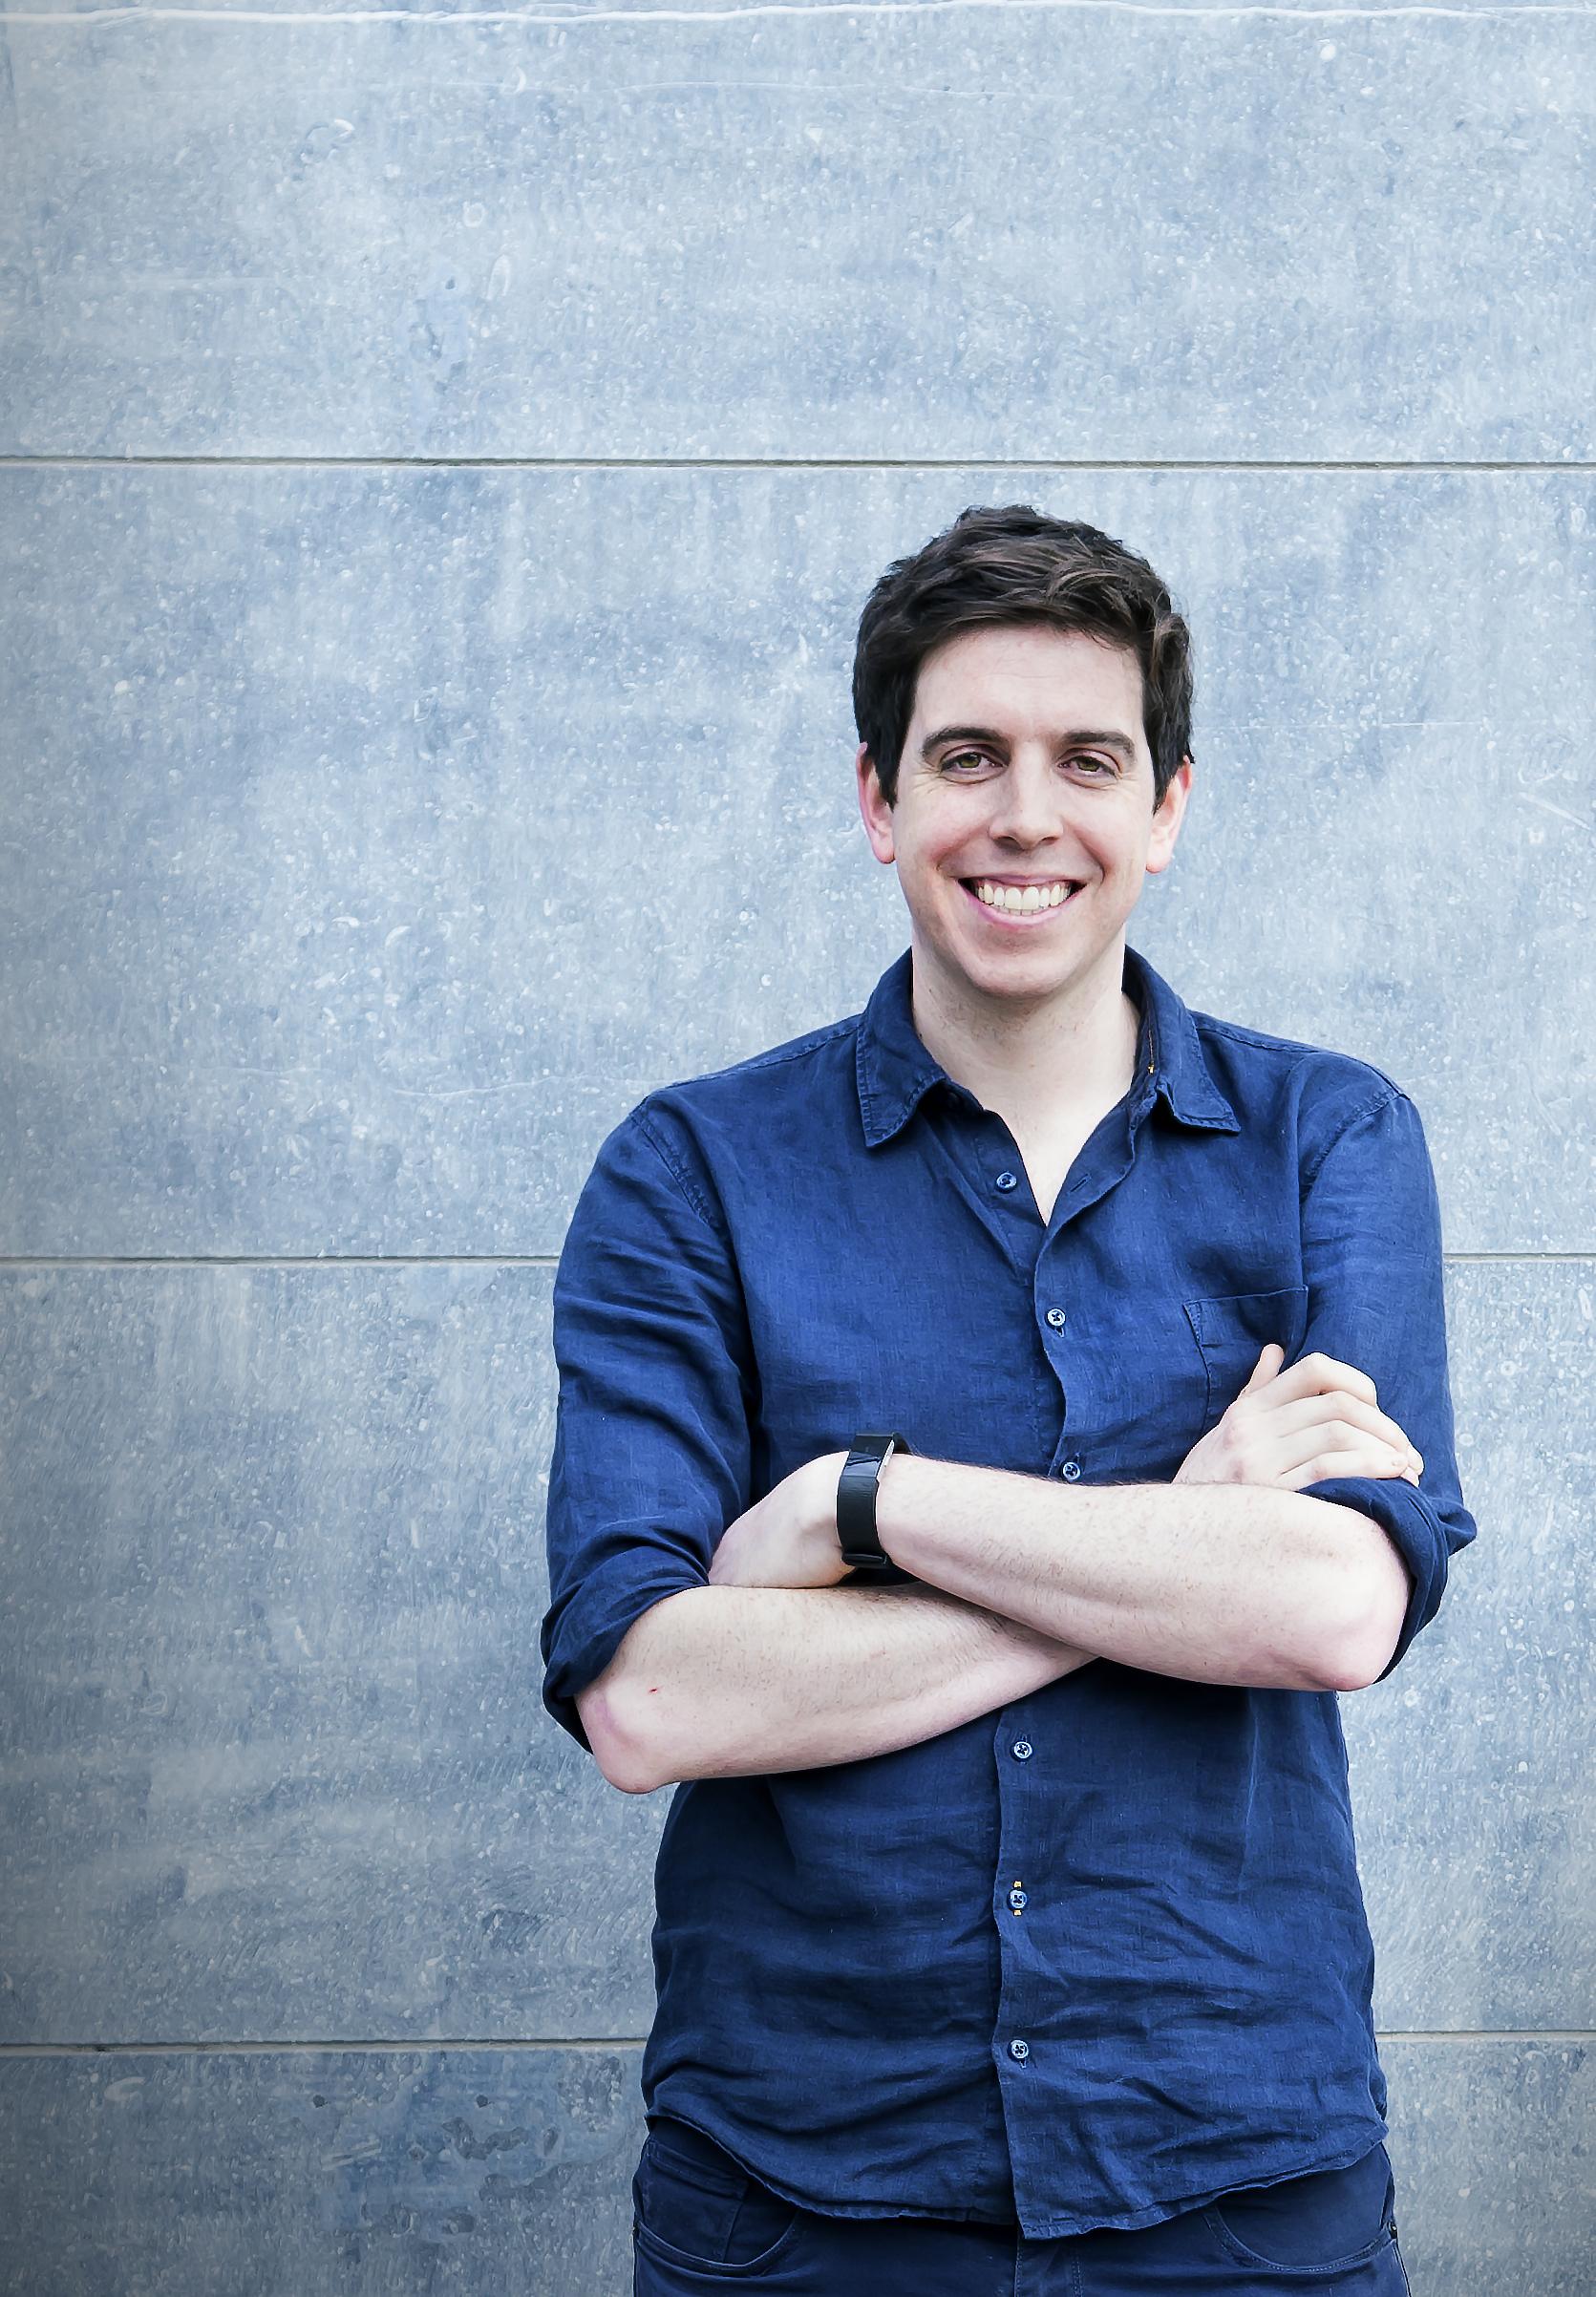 Daniel Horgan of Man Friday, Kinsale